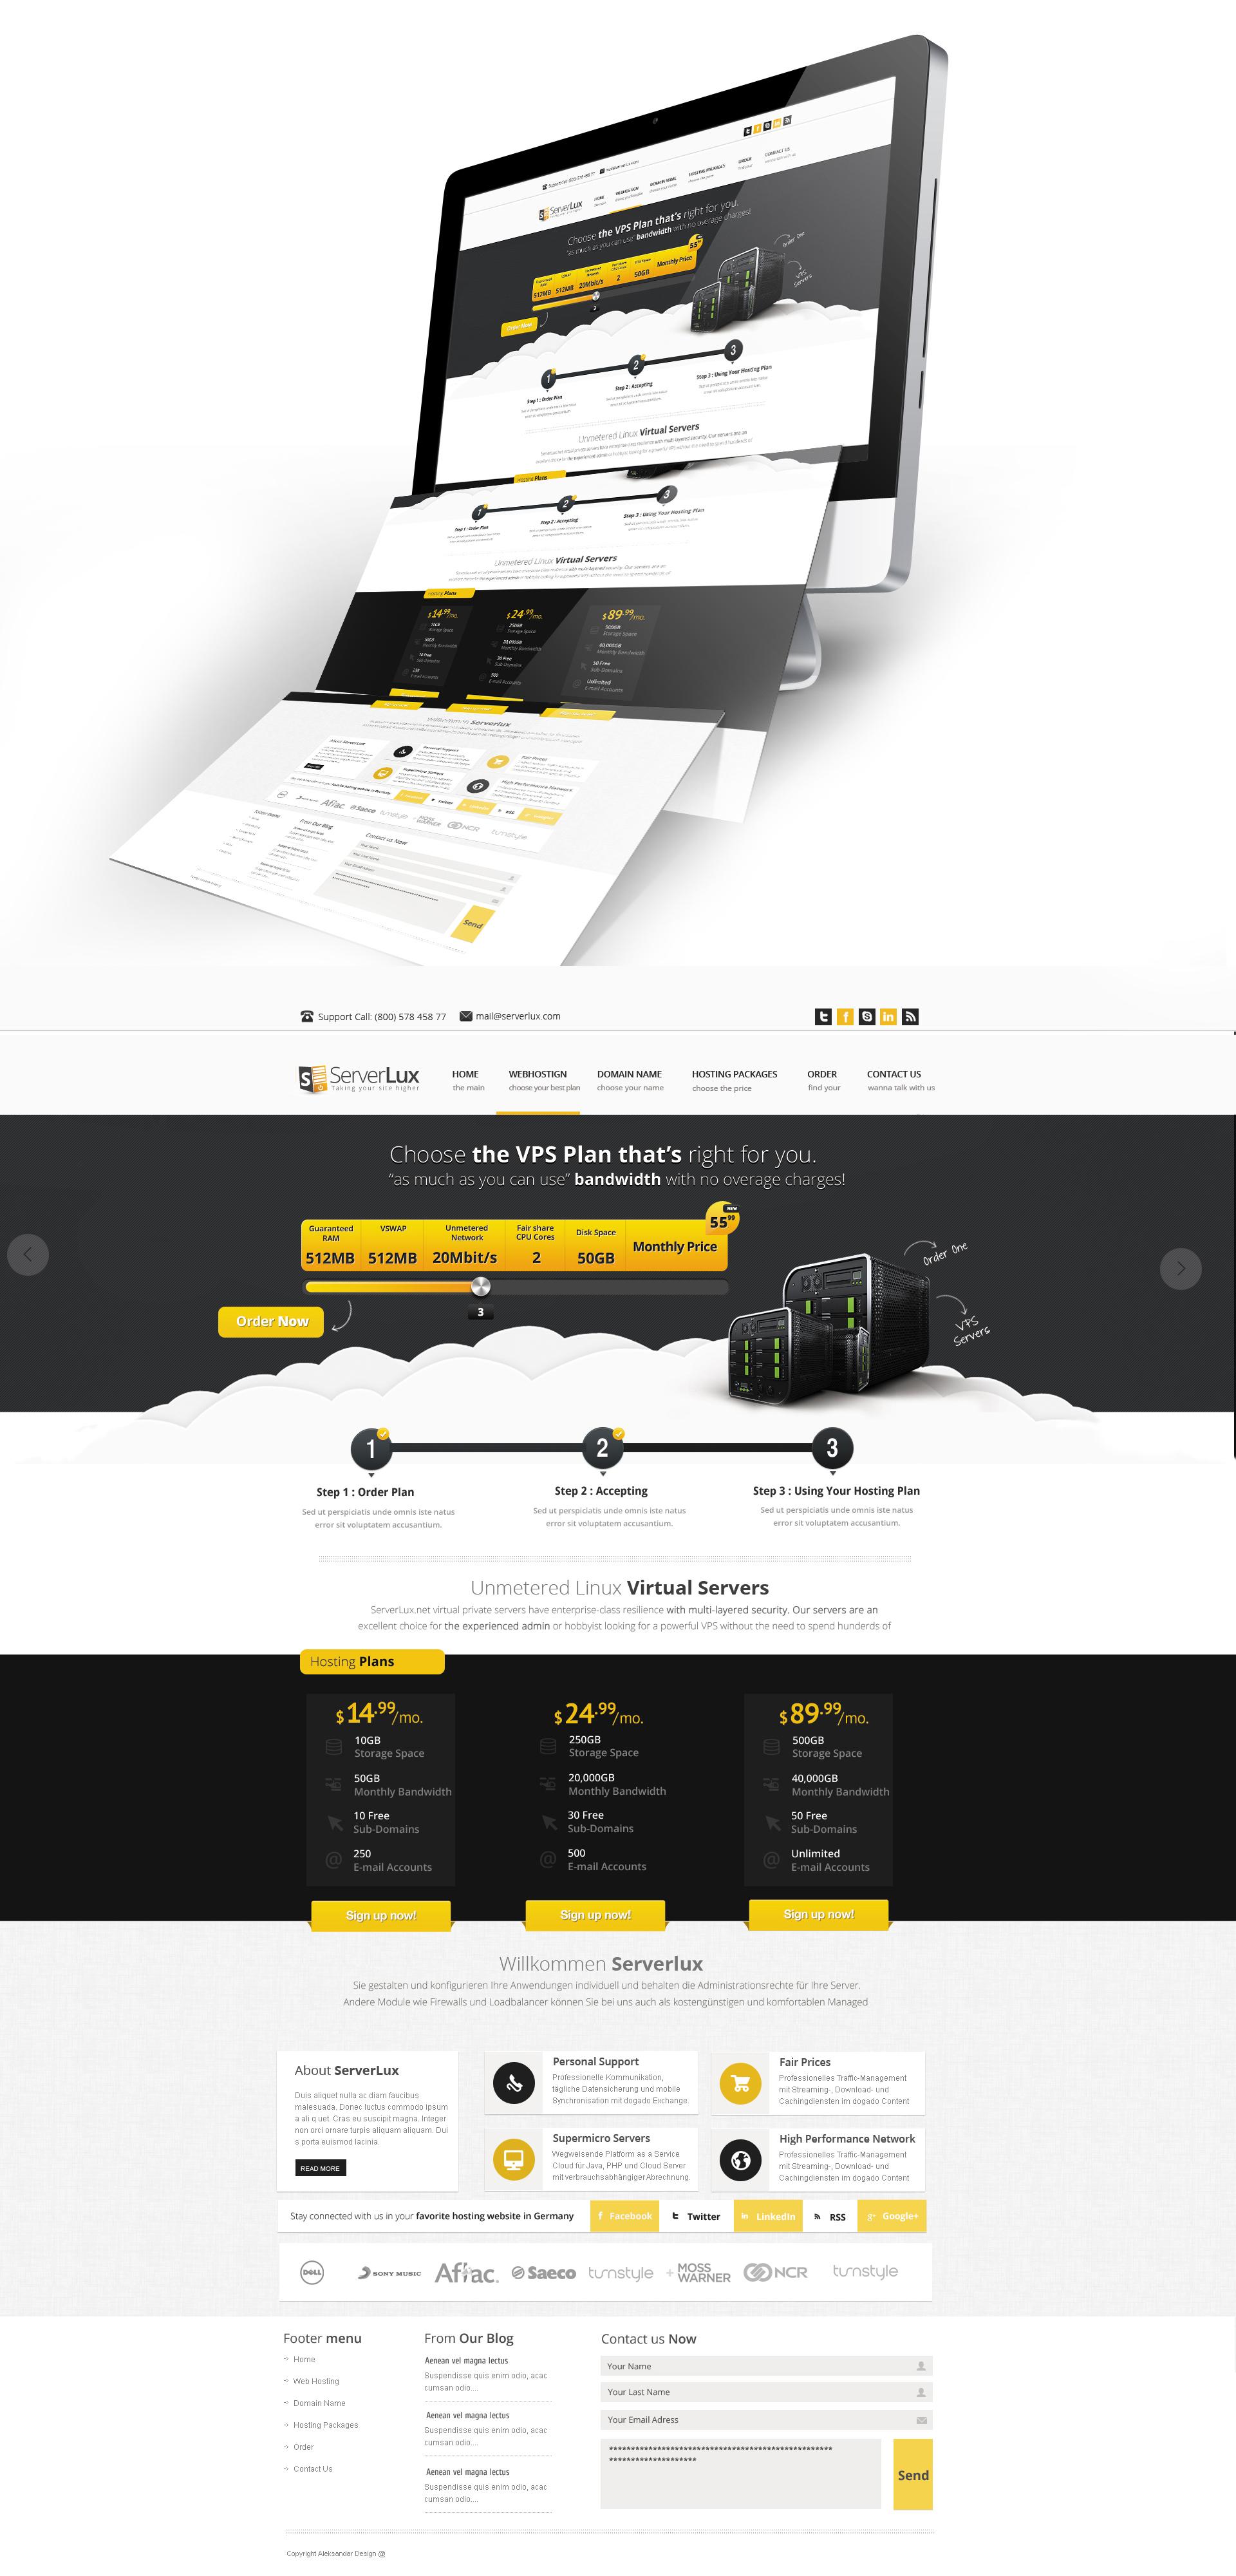 Proffesional Web Design Services